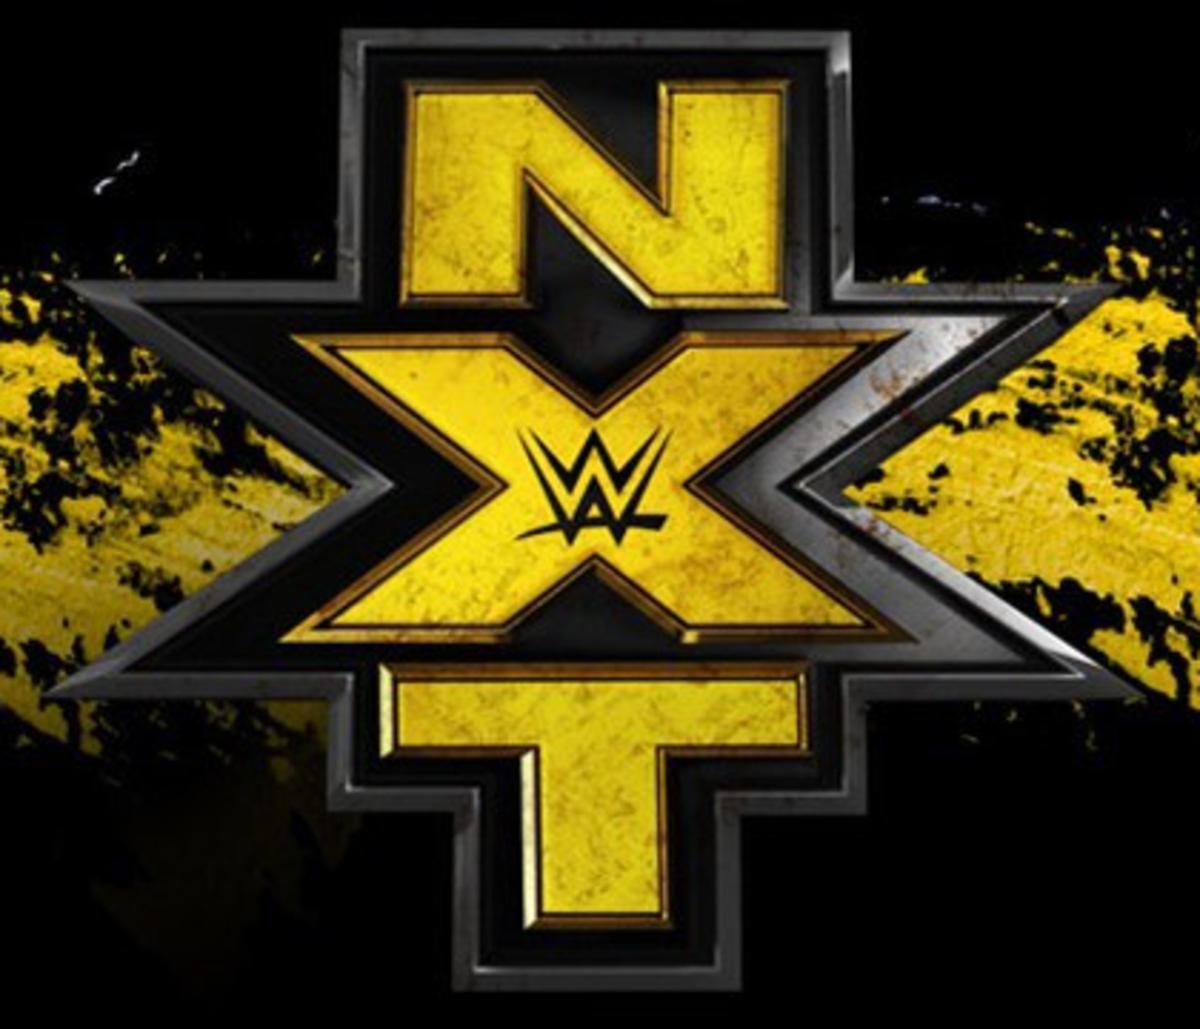 Wwe_nxt_logo_2014_2